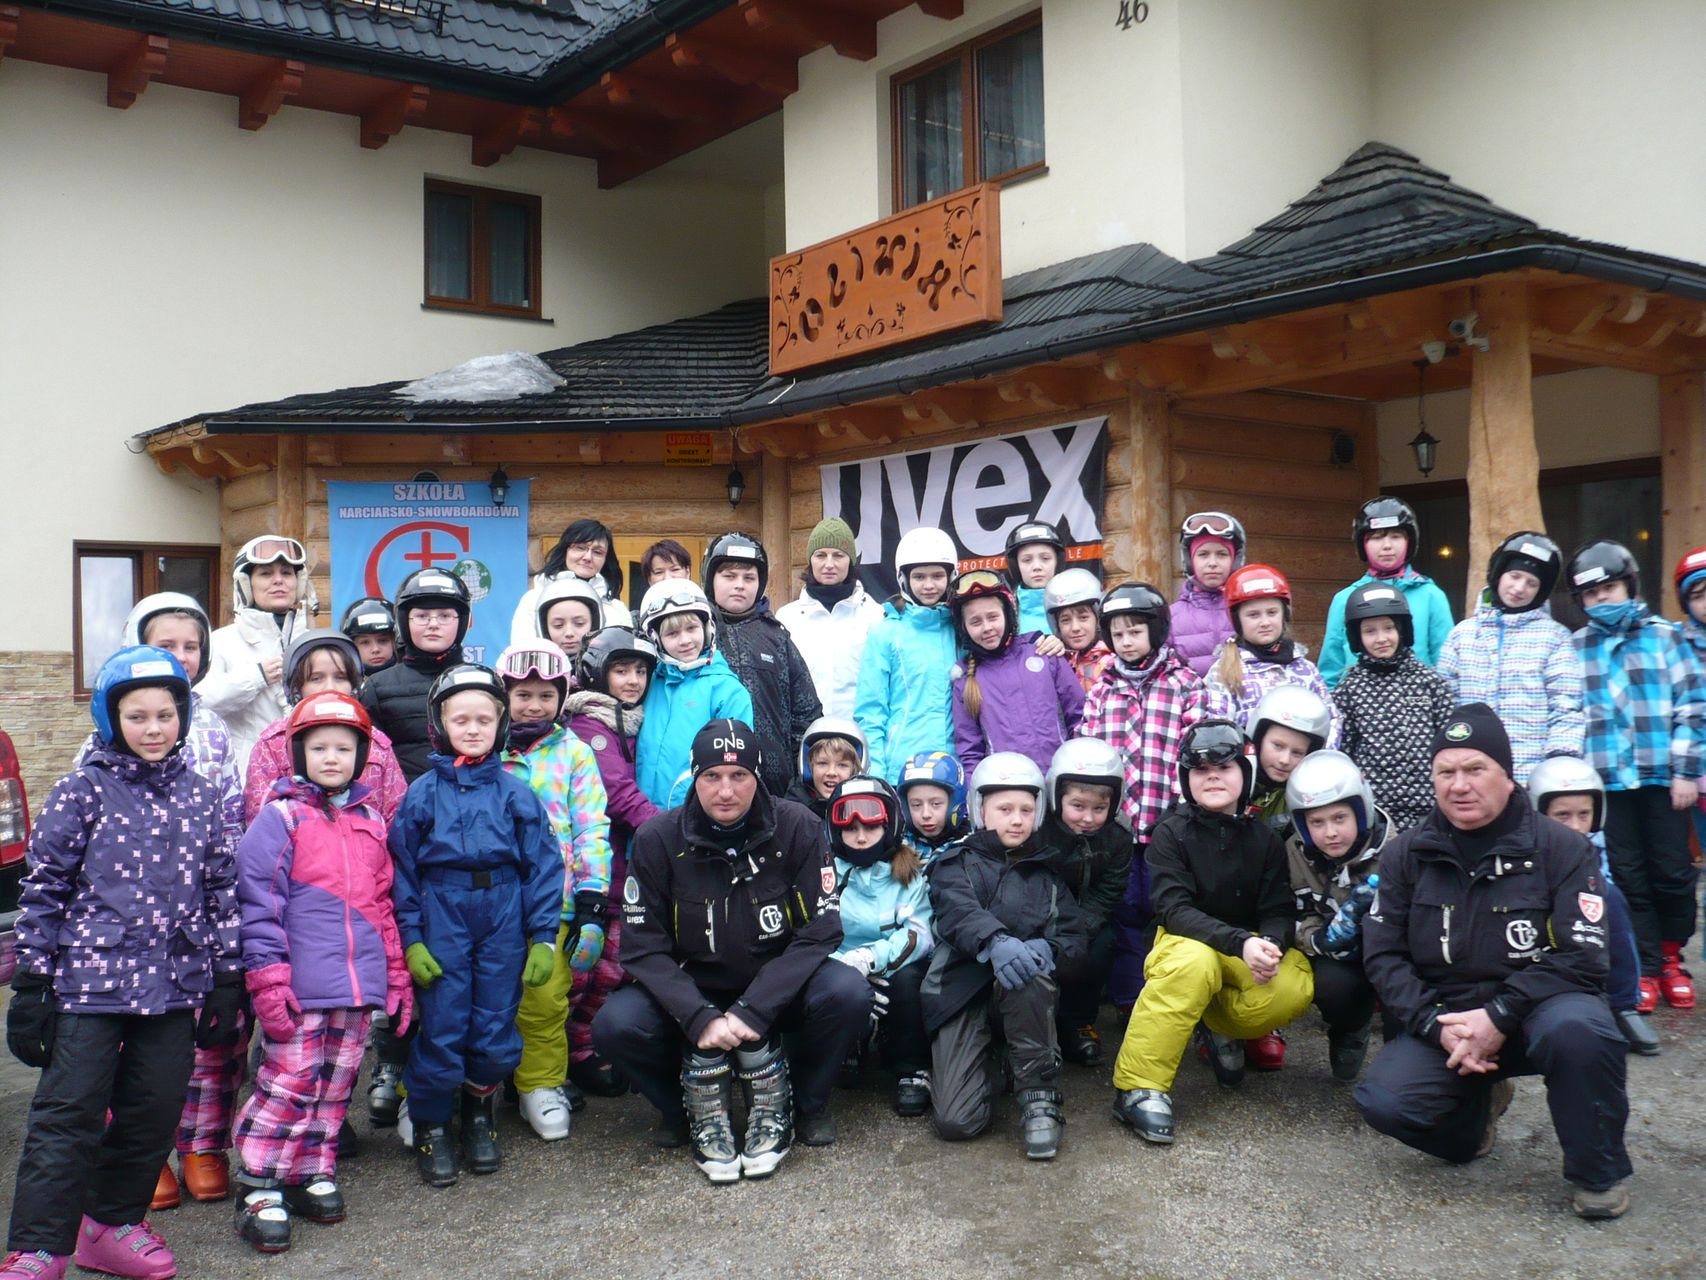 CarTourist_narty-snowboard_2013-foto-26